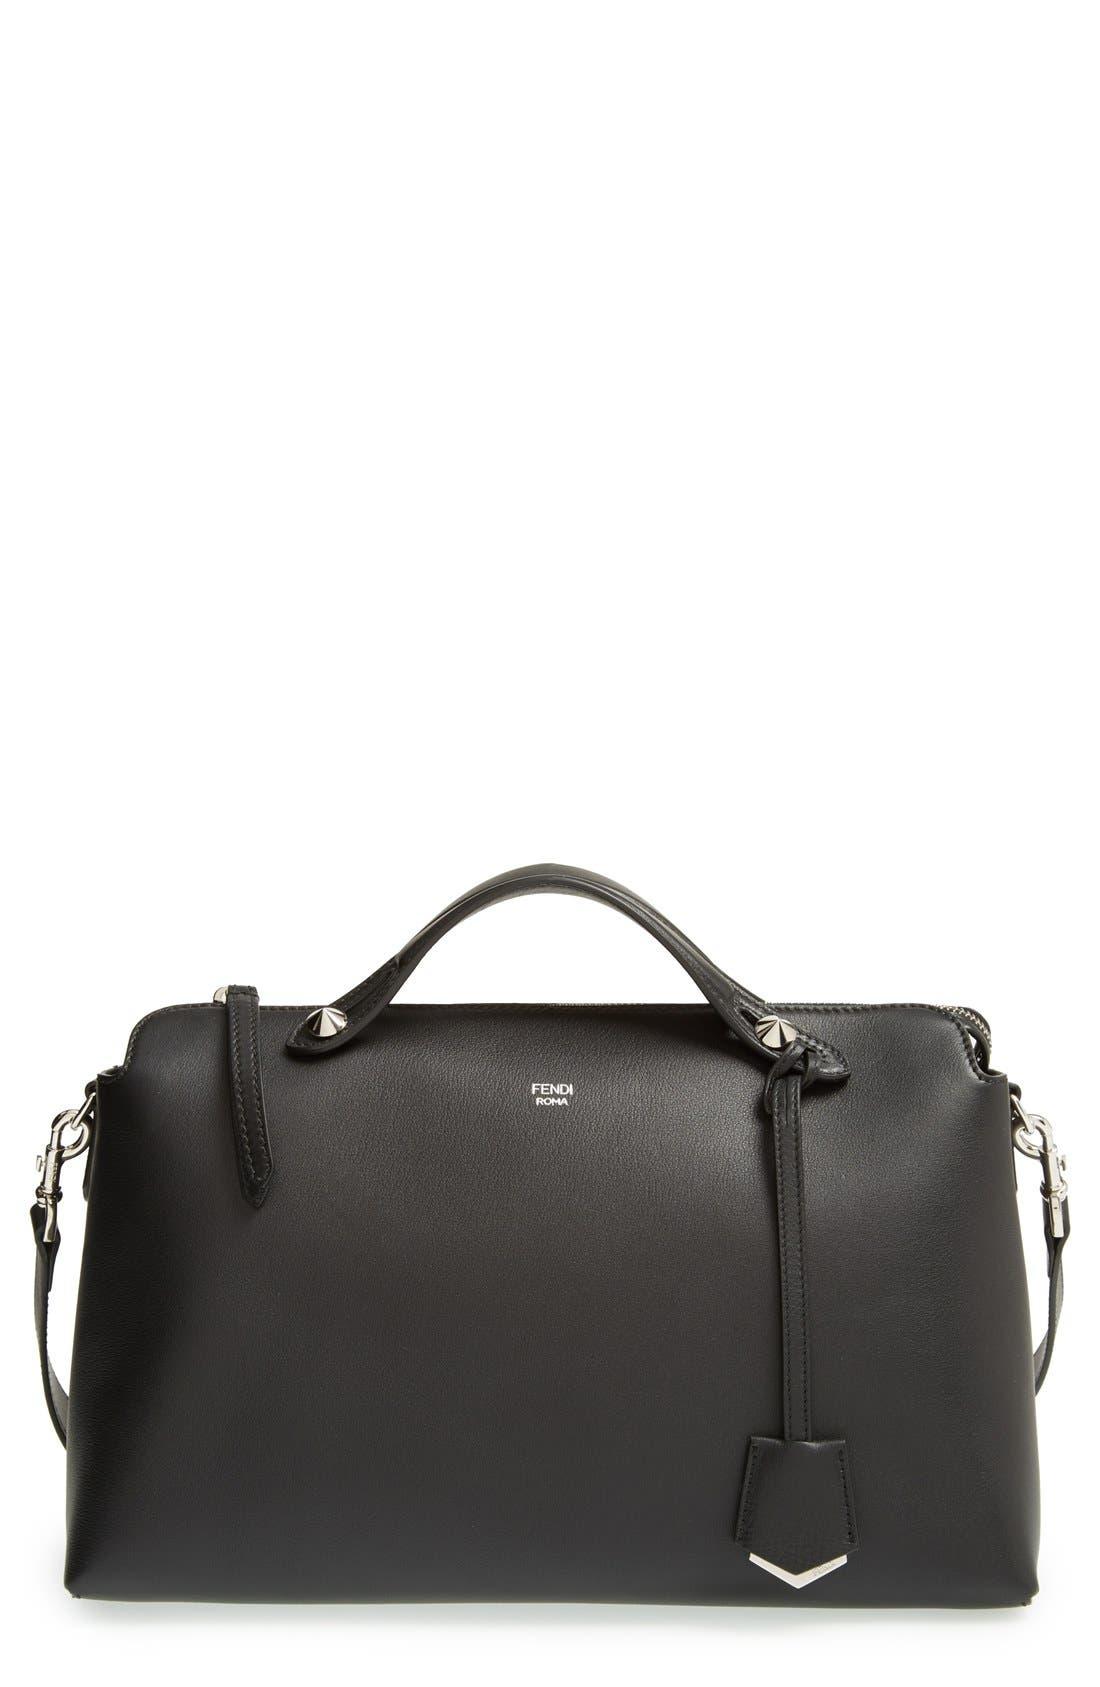 FENDI Large by the Way Leather Shoulder Bag